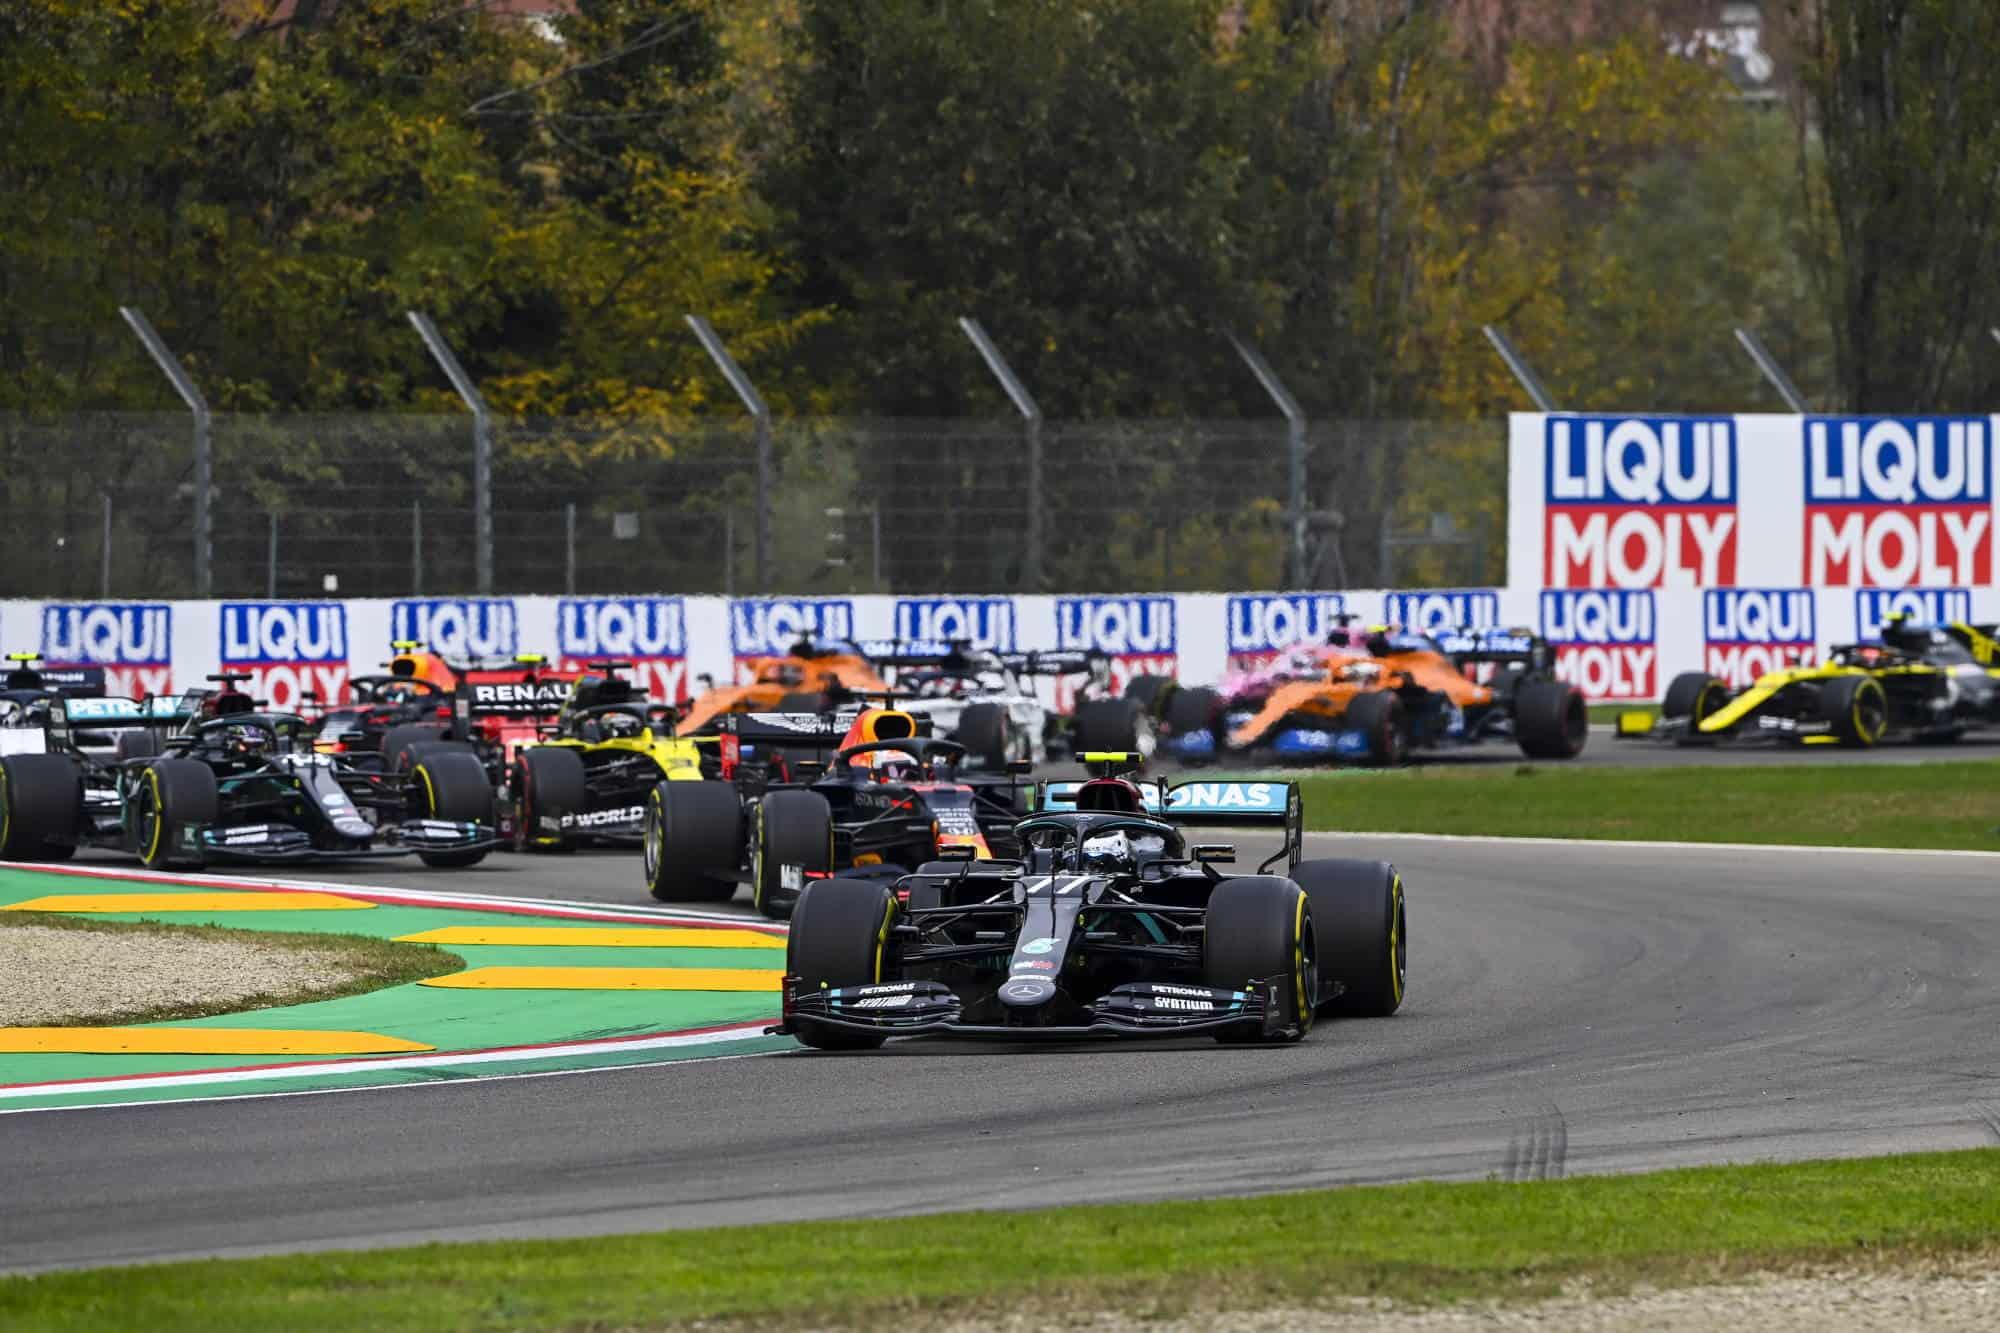 2020 Emilia Romagna Imola Bottas leads Verstappen Hamilton first lap start of the race Photo Daimler